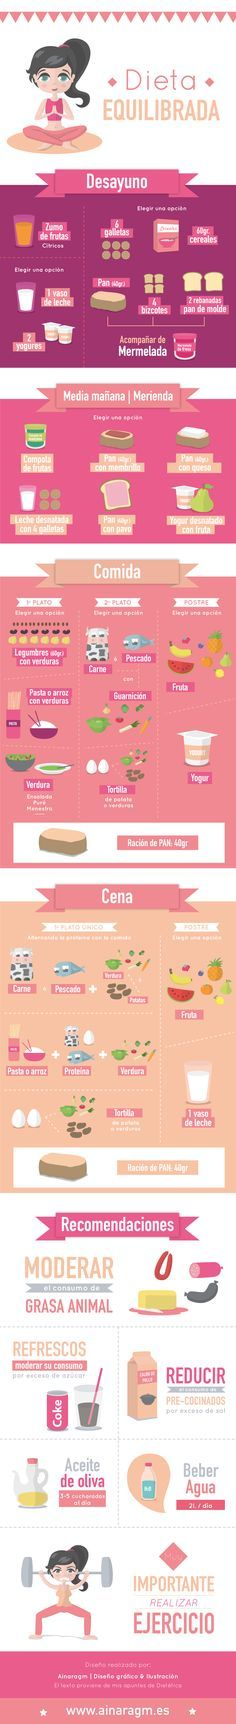 Infografía de una #dieta equilibrada #alimentacion #dietetica #salud #infografia